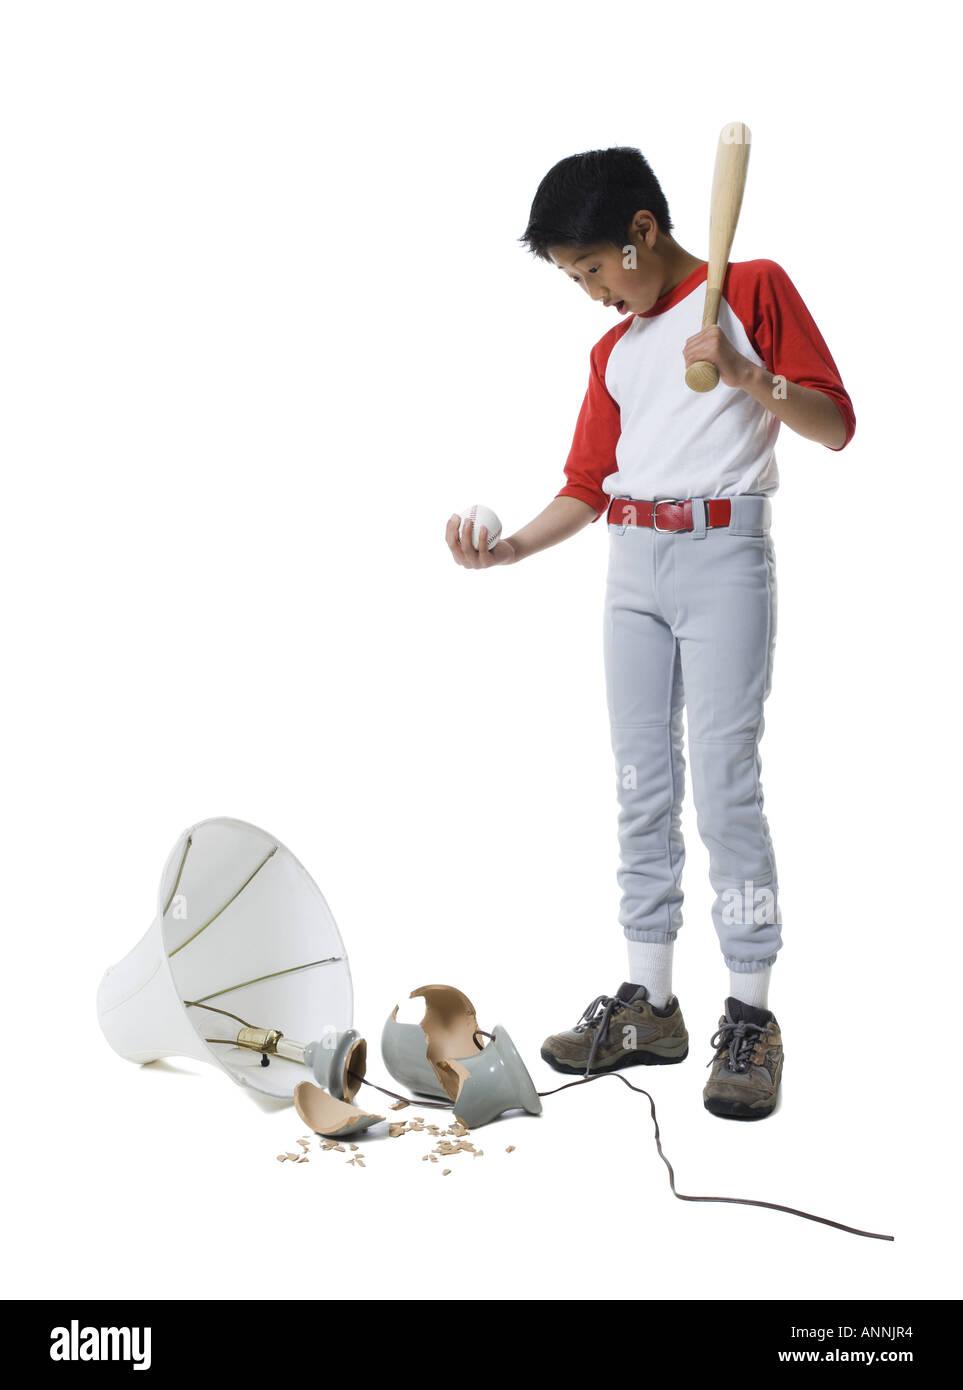 Boy holding a baseball bat with a ball looking down at a broken ...